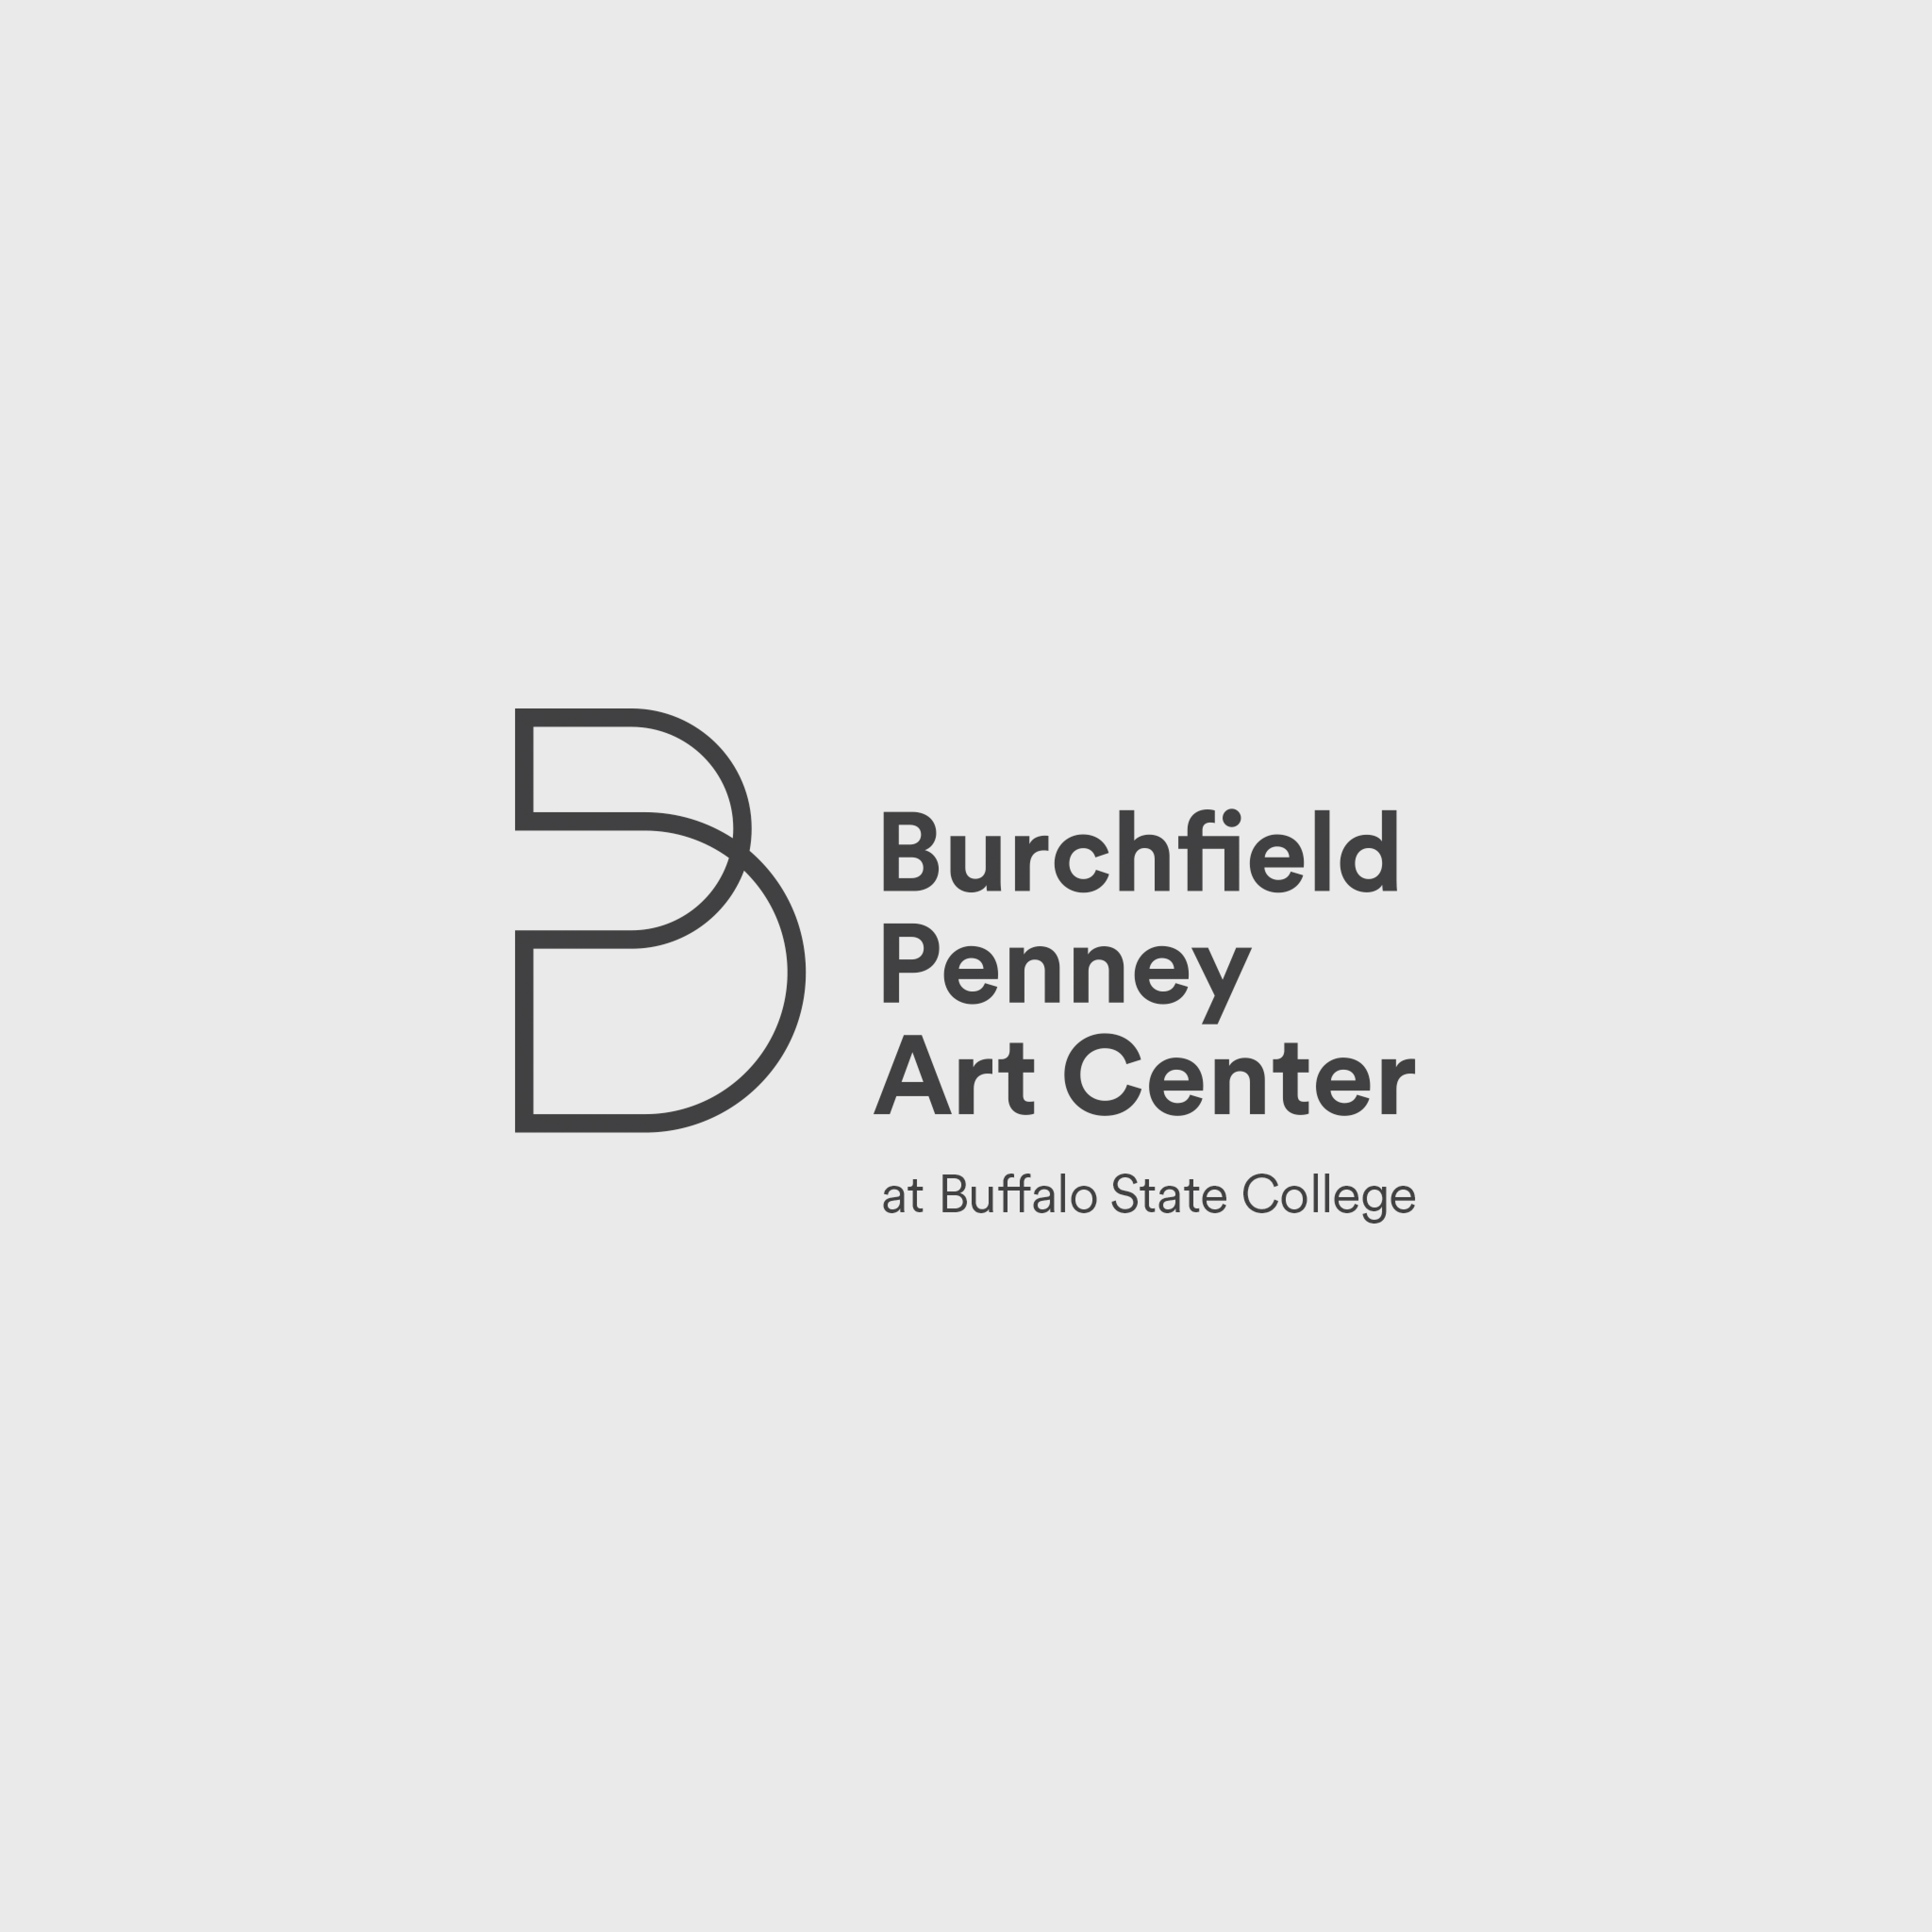 phyllis i thompson artists burchfield penney art center. Black Bedroom Furniture Sets. Home Design Ideas